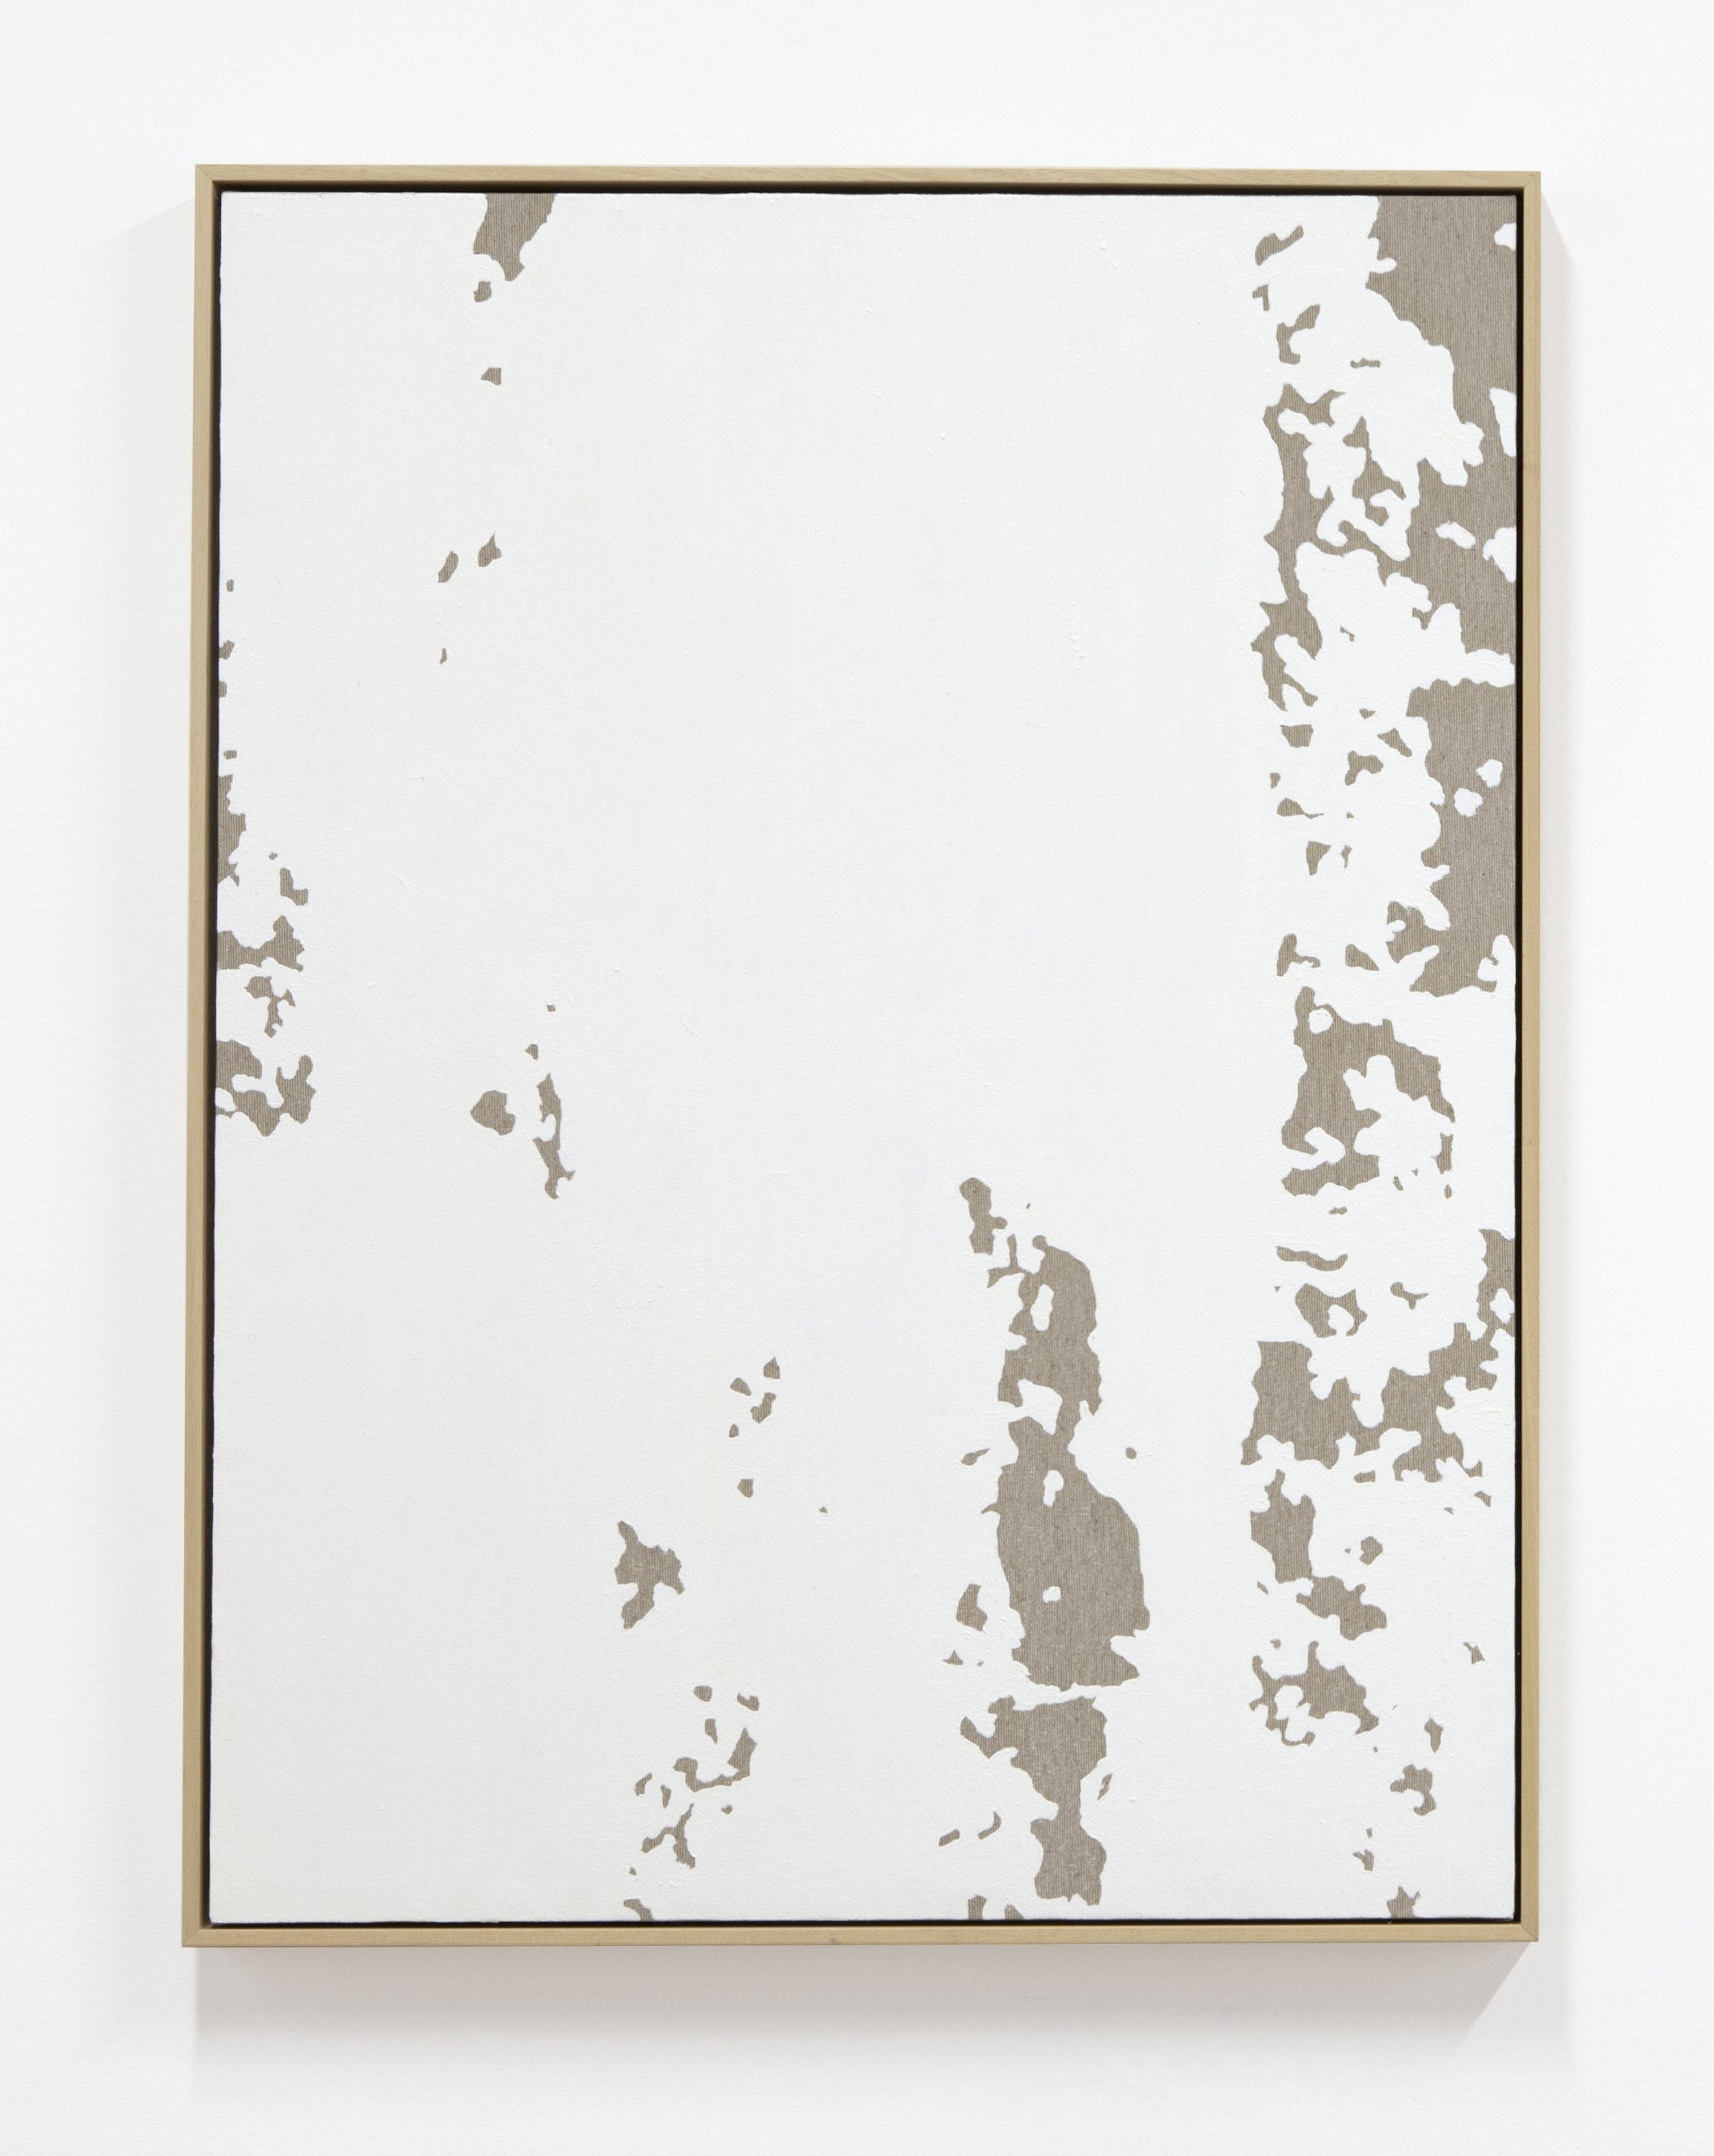 PedroMatos  Fainter and fainter , 2015 Oil on unprimed canas, wooden stretchers, natural wood frame,  80 x 60 cm  Photo: Hubert Marot